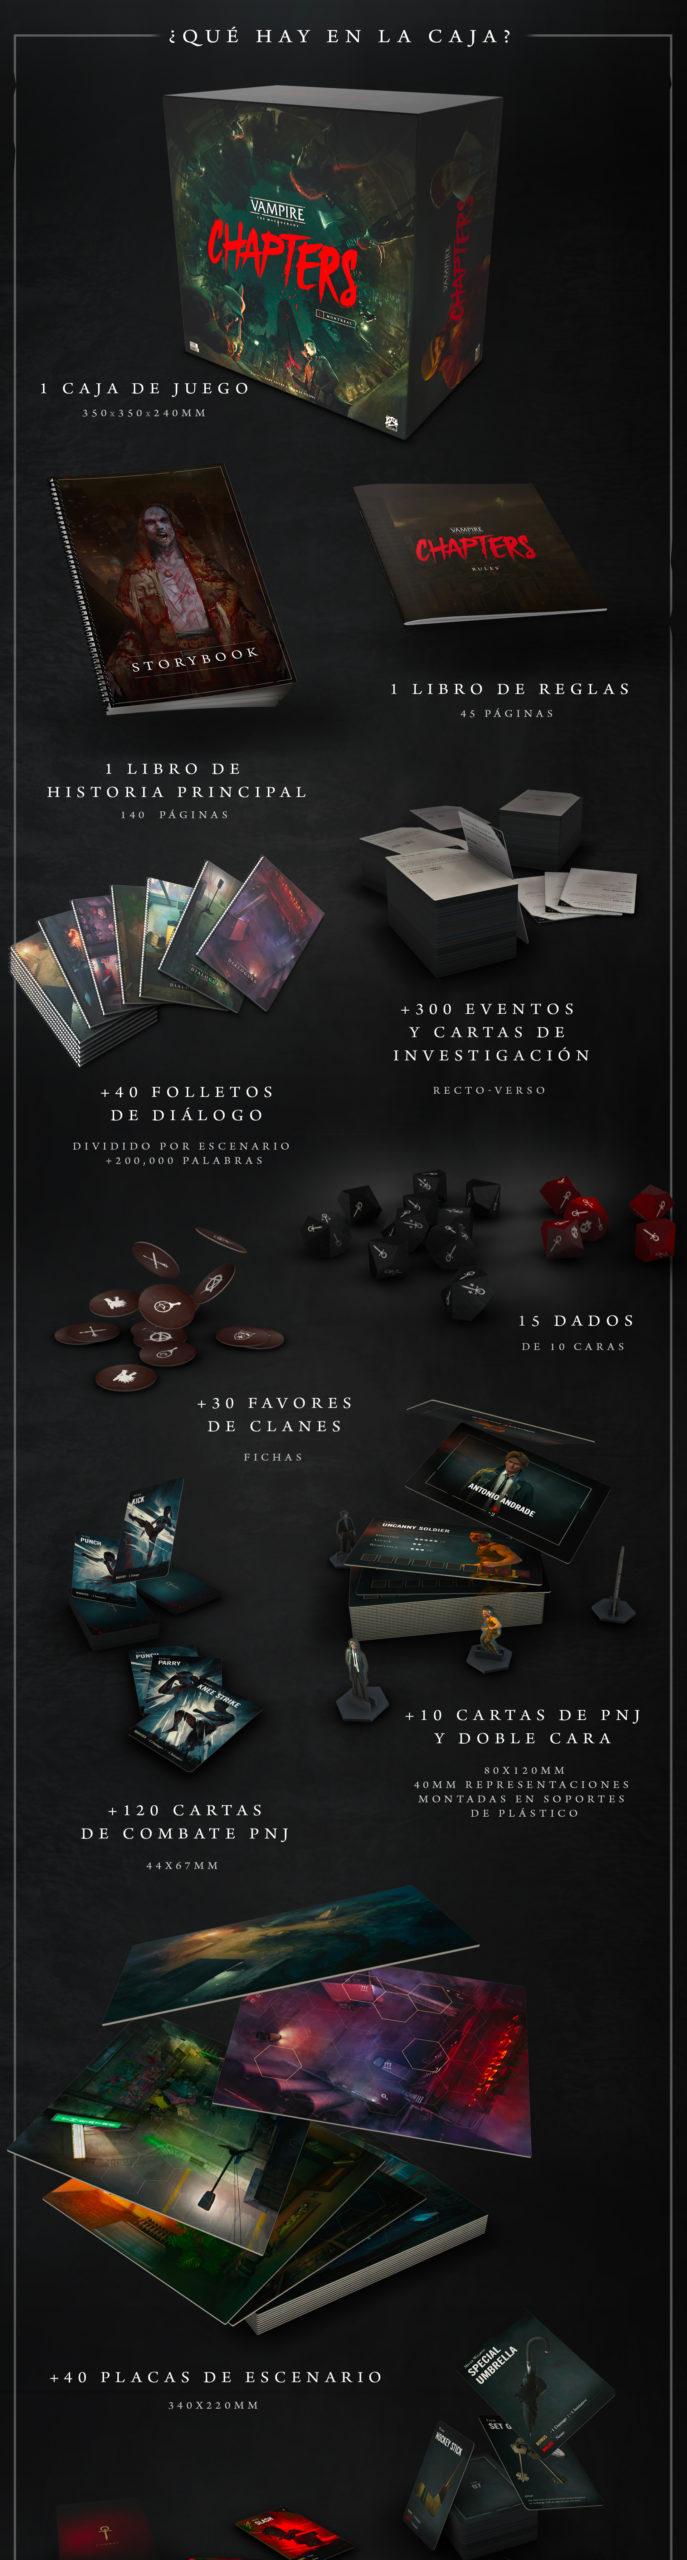 insidebox_1